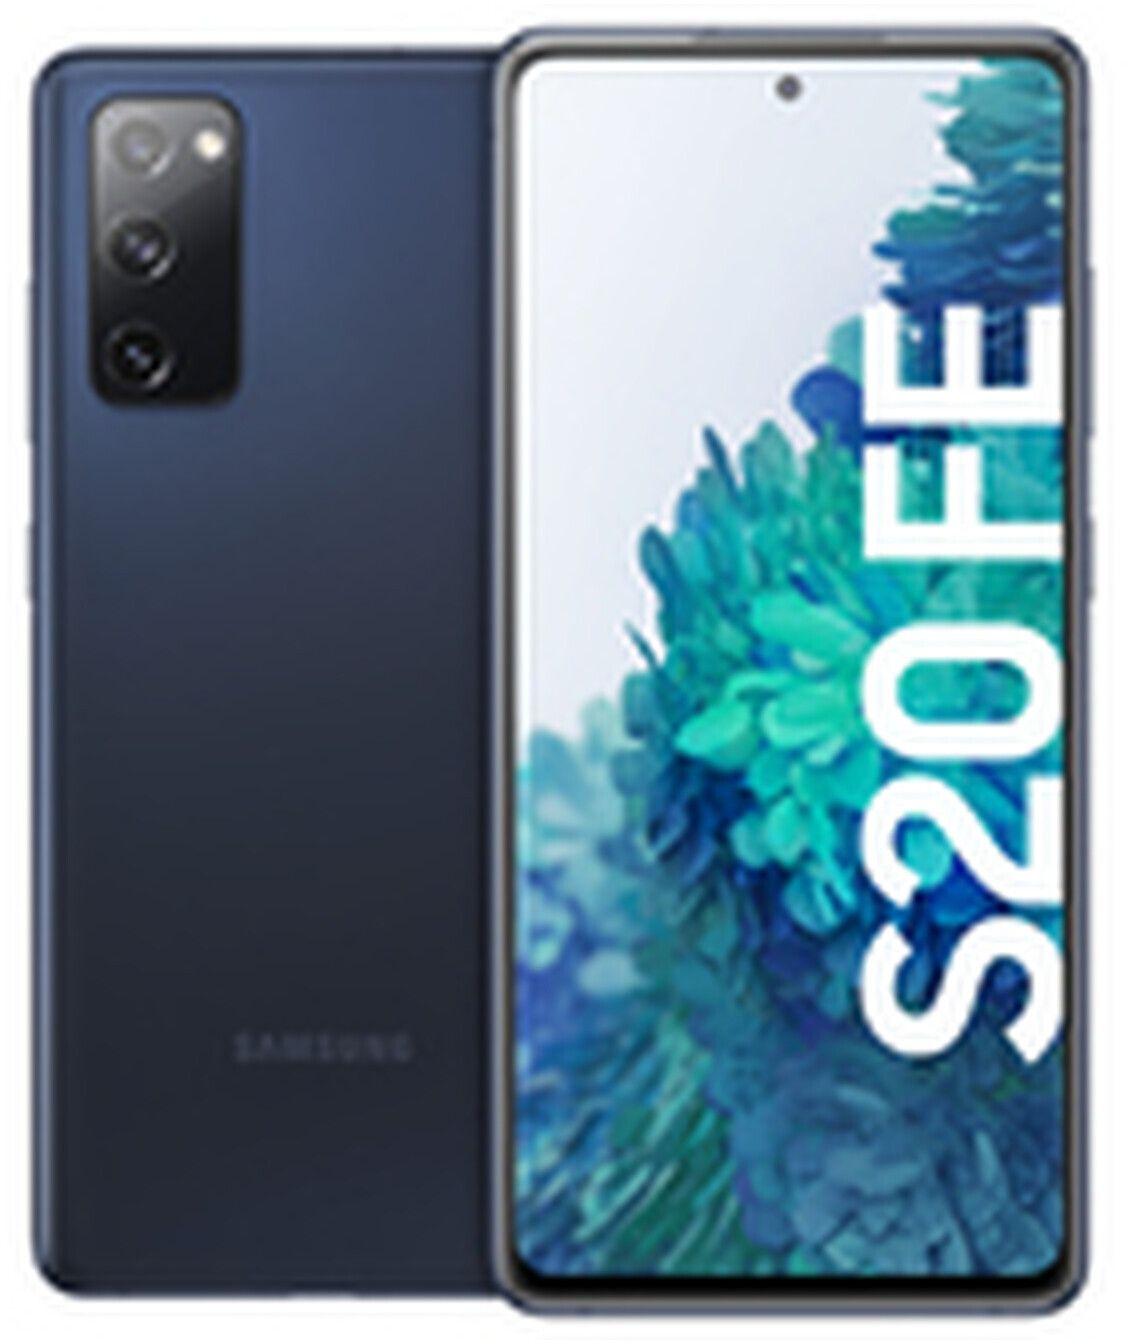 Samsung Galaxy S20 FE Snapdragon 256GB im O2 Blue (12GB LTE 50Mbit, Allnet/SMS, VoLTE) mtl. 19,99€ einm. 139